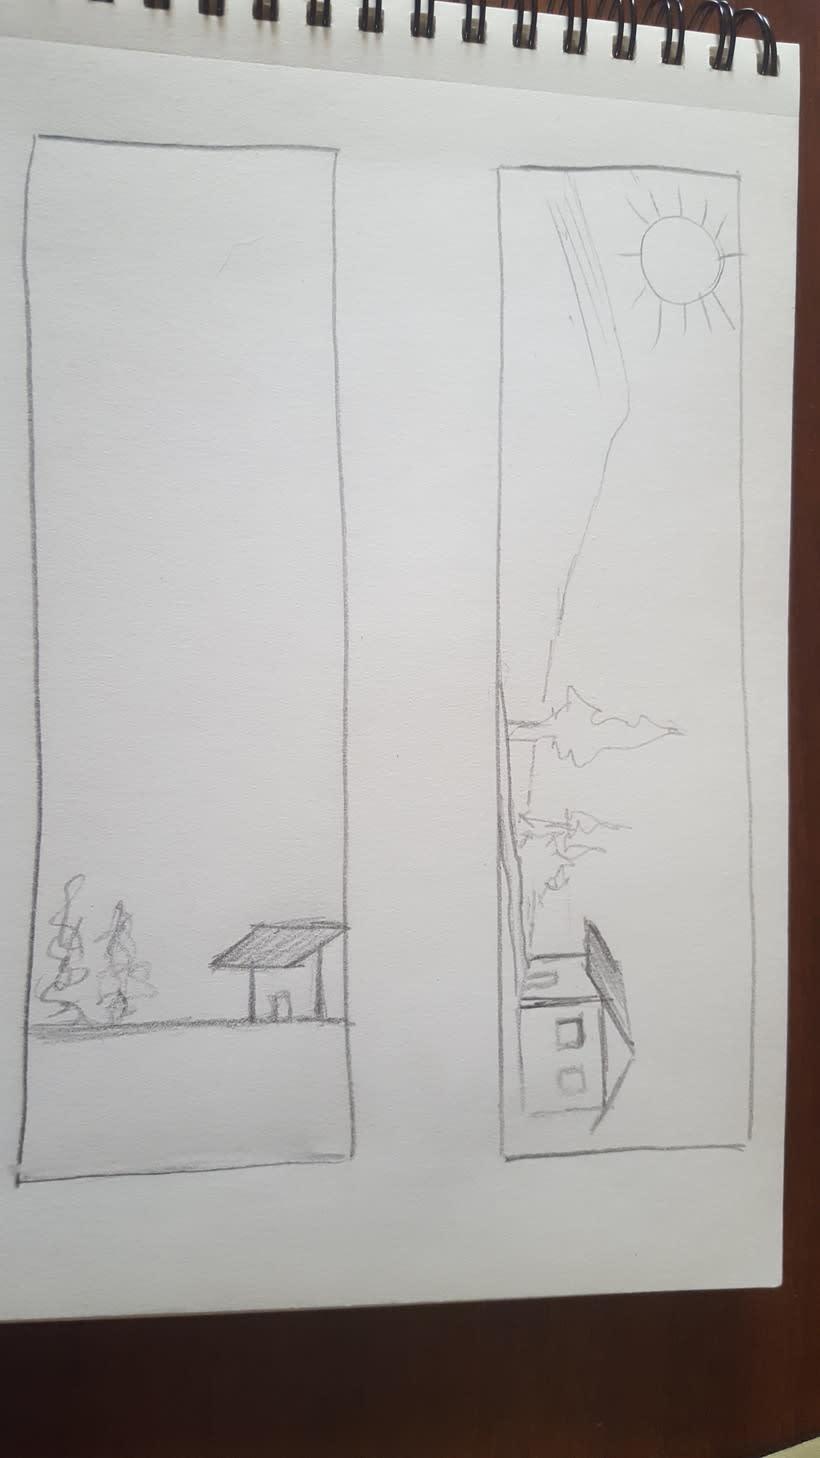 paisaje vertical y horizontal pili -1